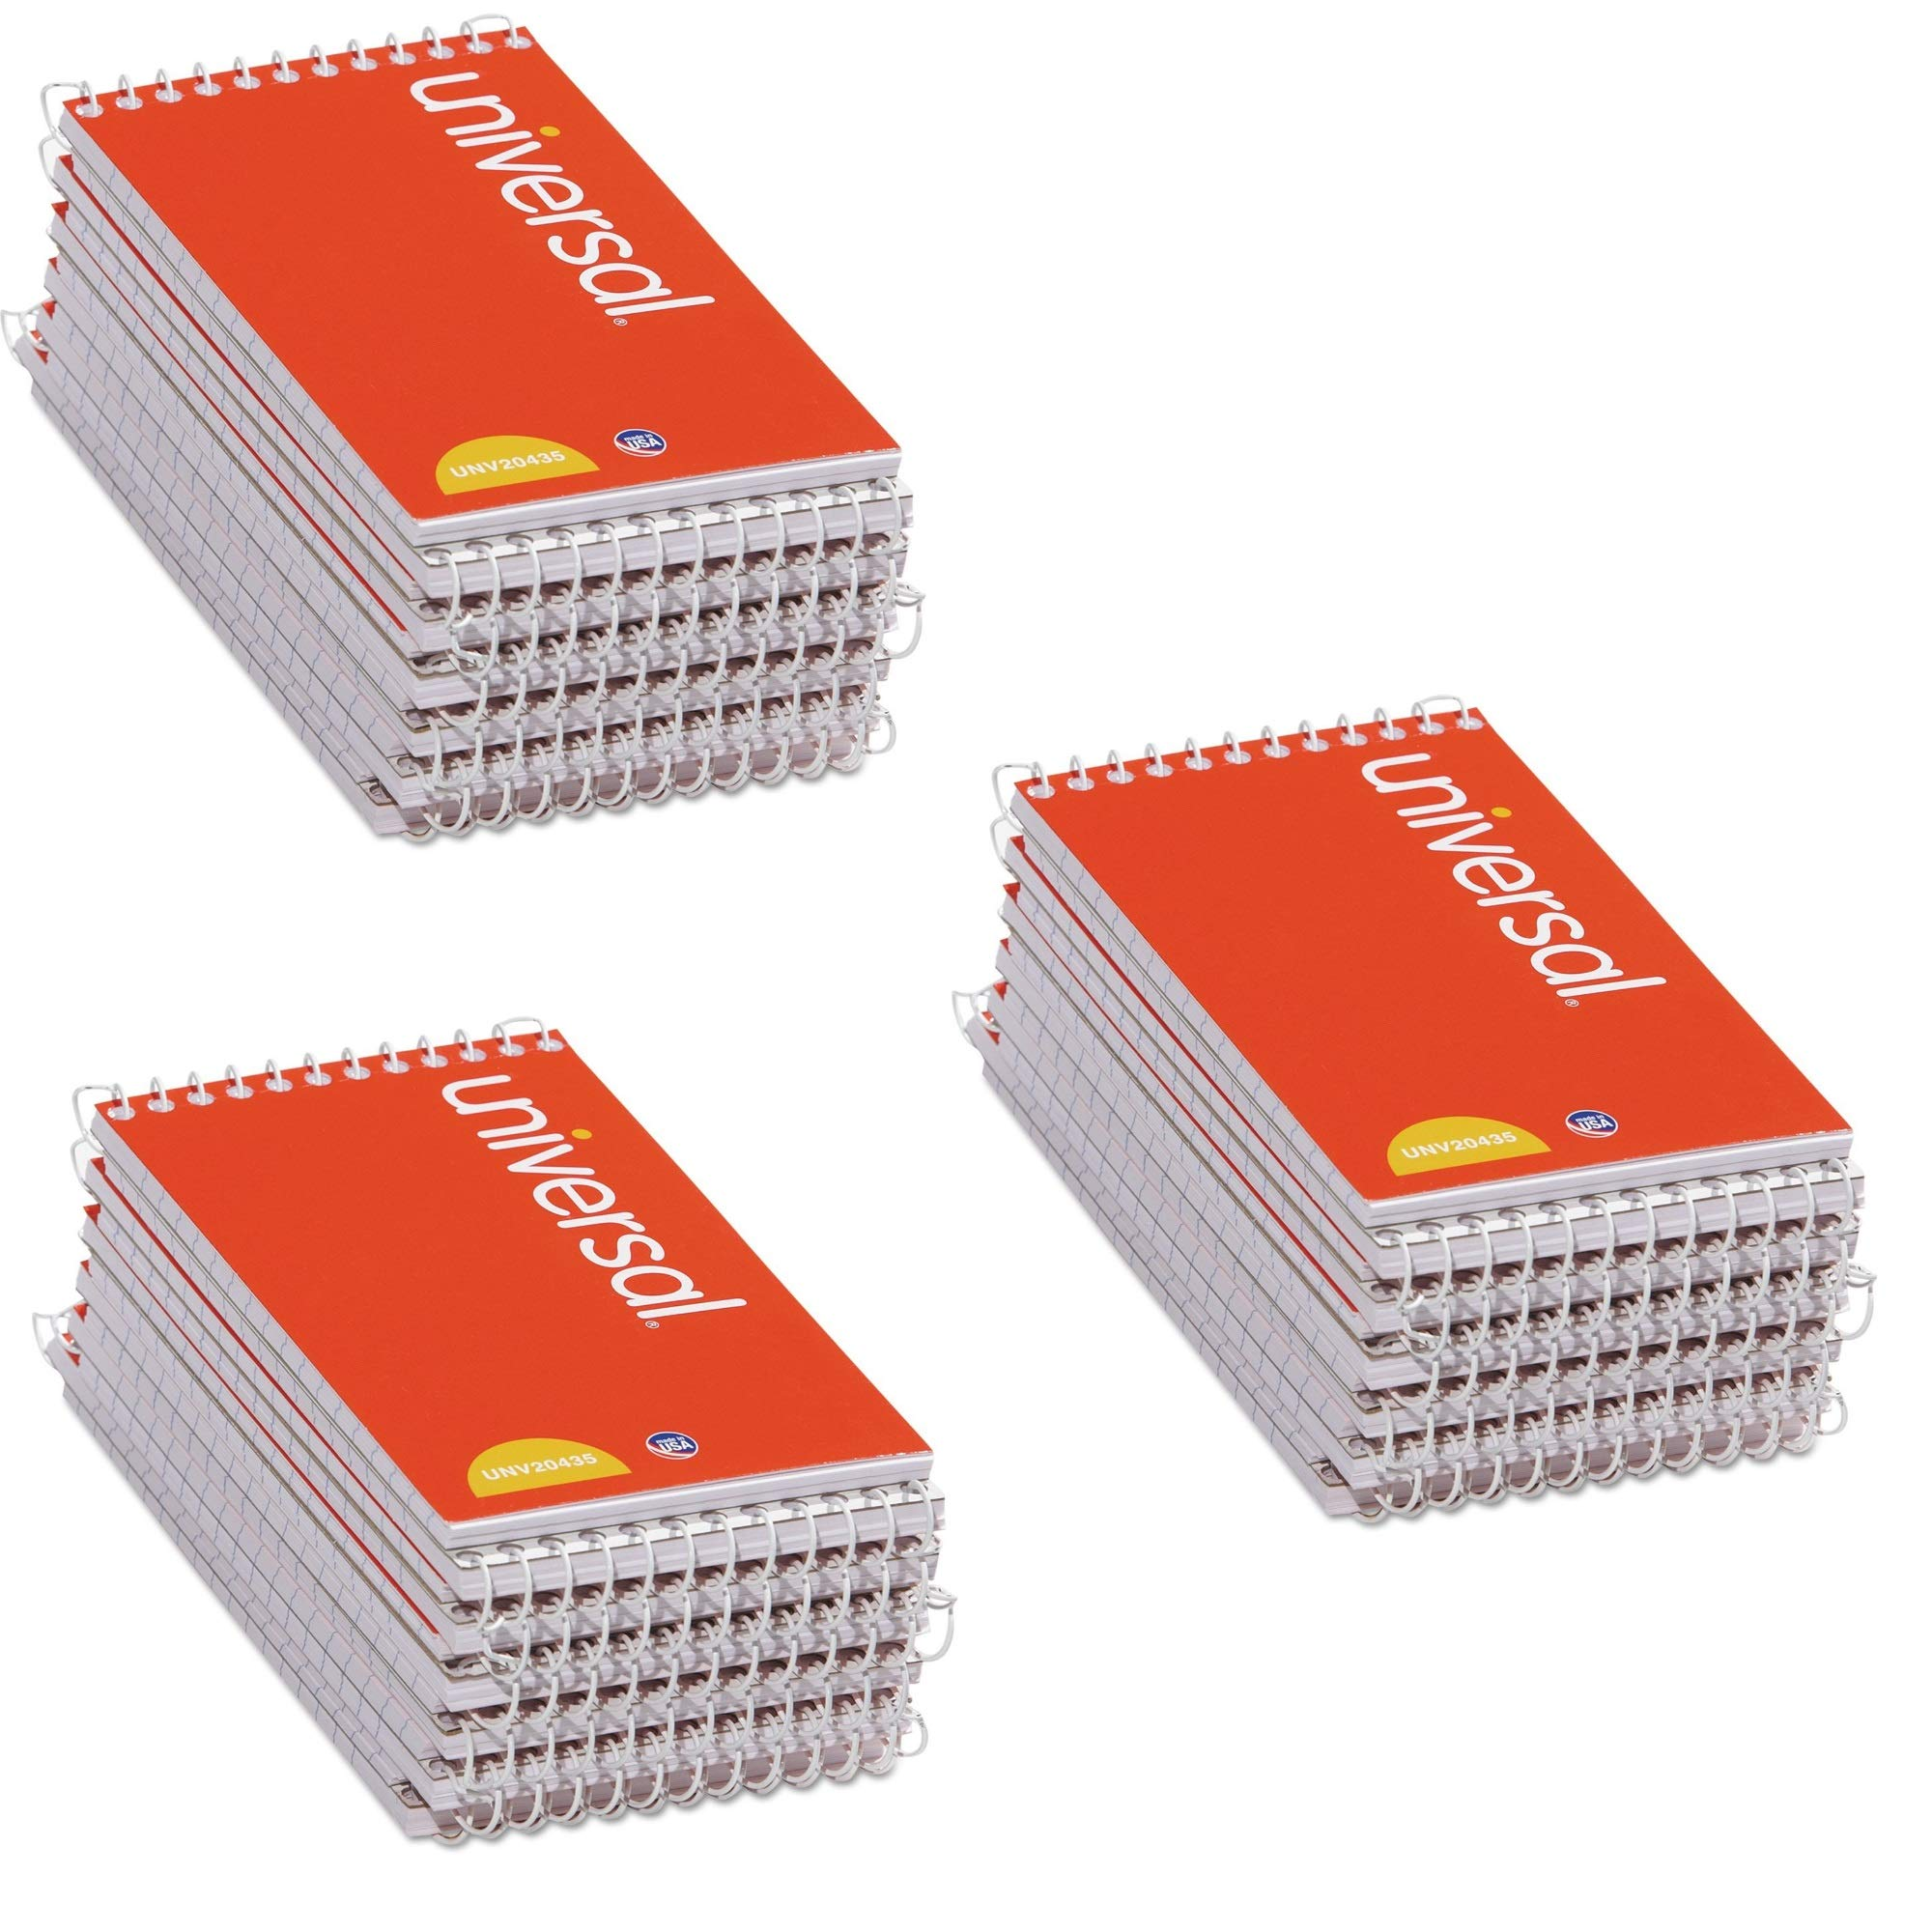 Universal 3x5-Inch Narrow Ruled Wirebound Memo Book, 12 per Box (UNV20435-CL), 3 PACK